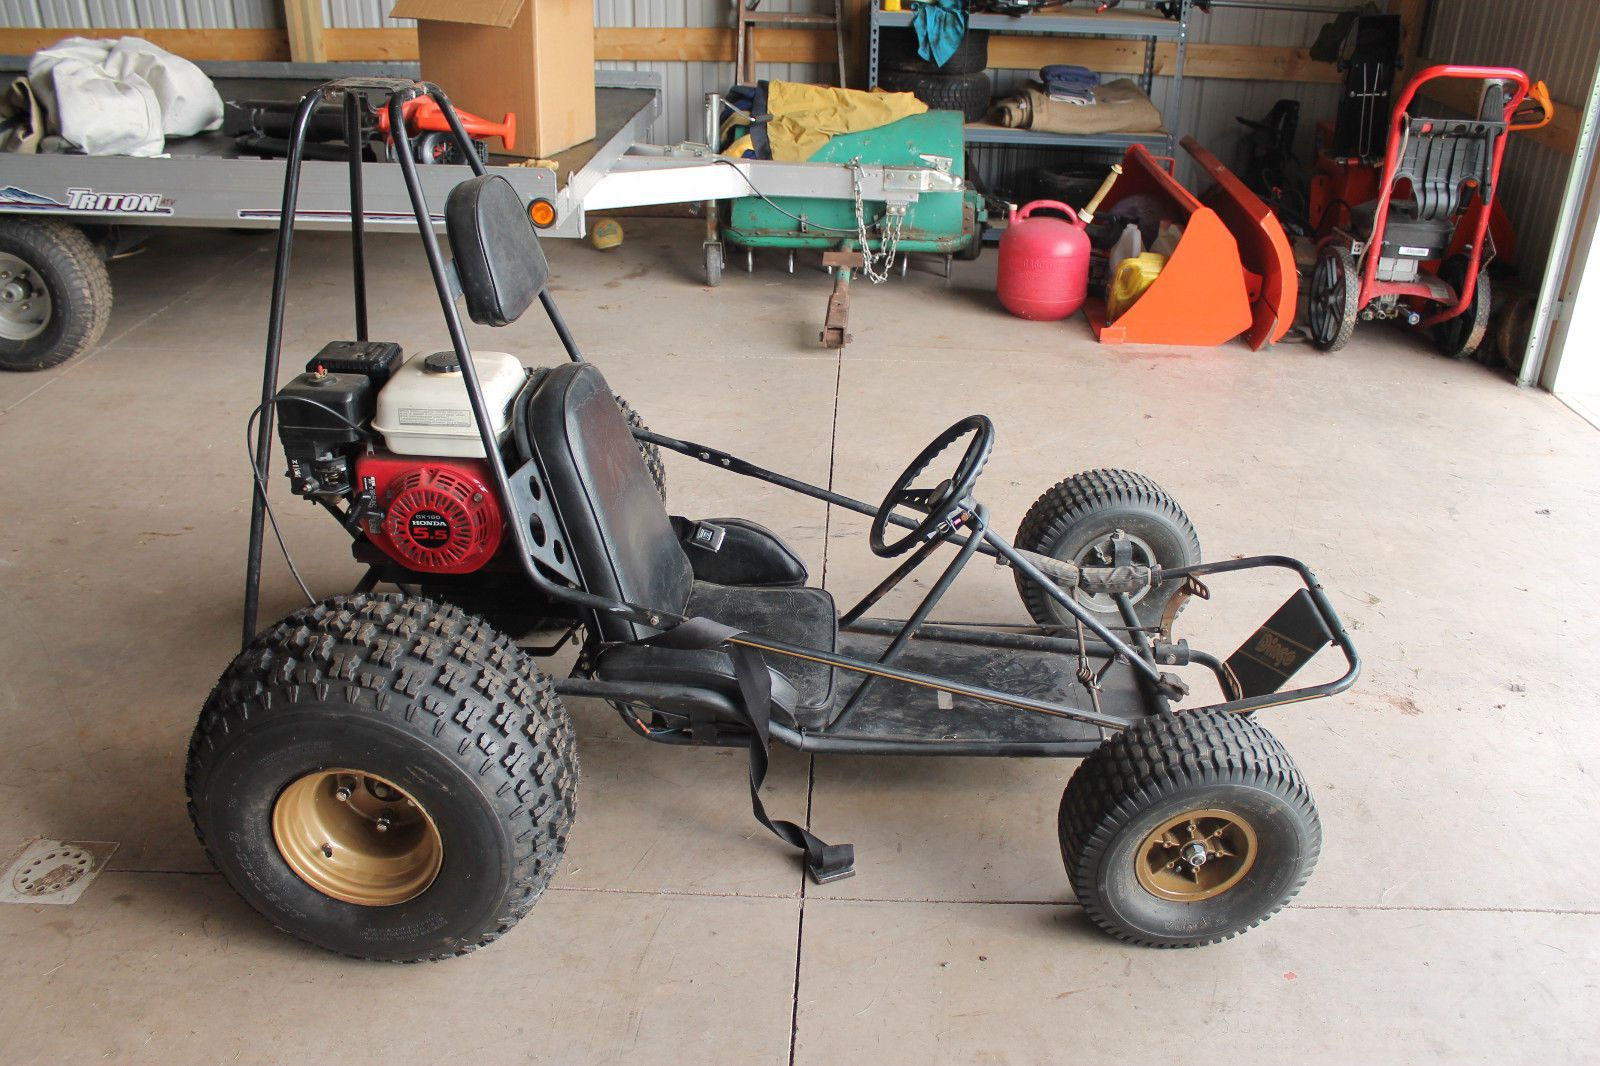 Manco Dingo 285 Road Buggy Kart - Year of Clean Water